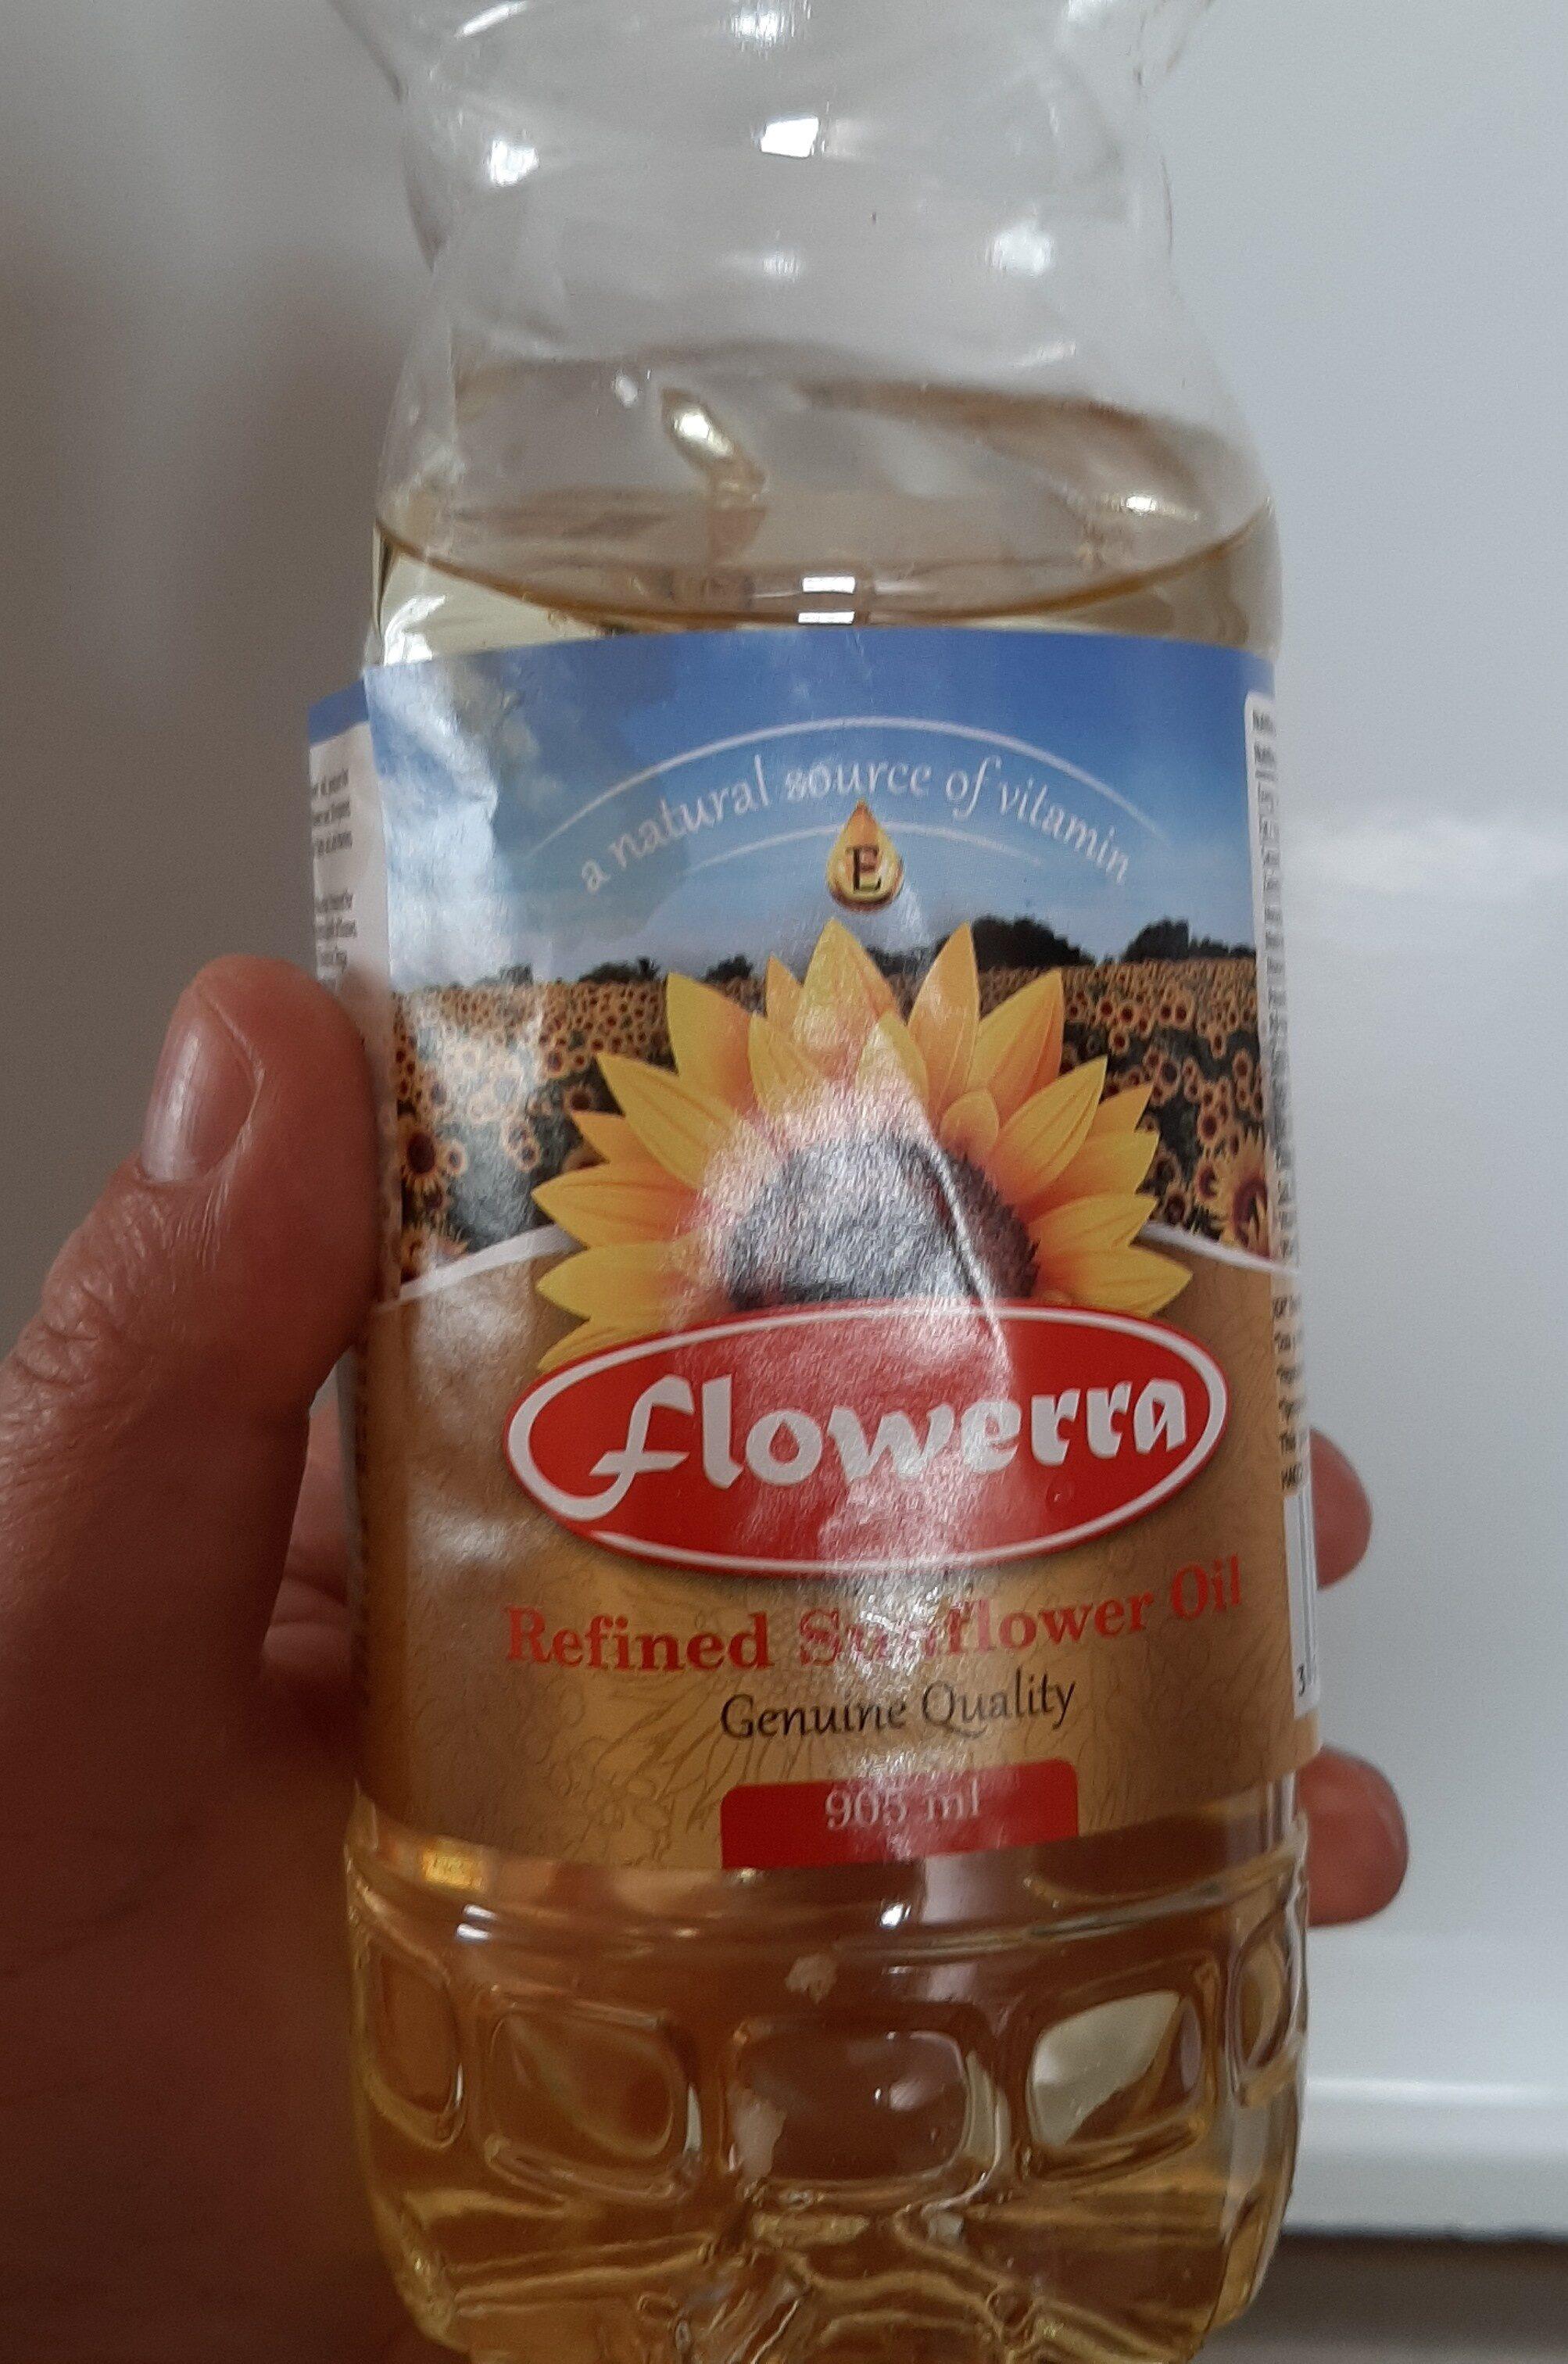 Refined Sunflower Oil - Ingrédients - en